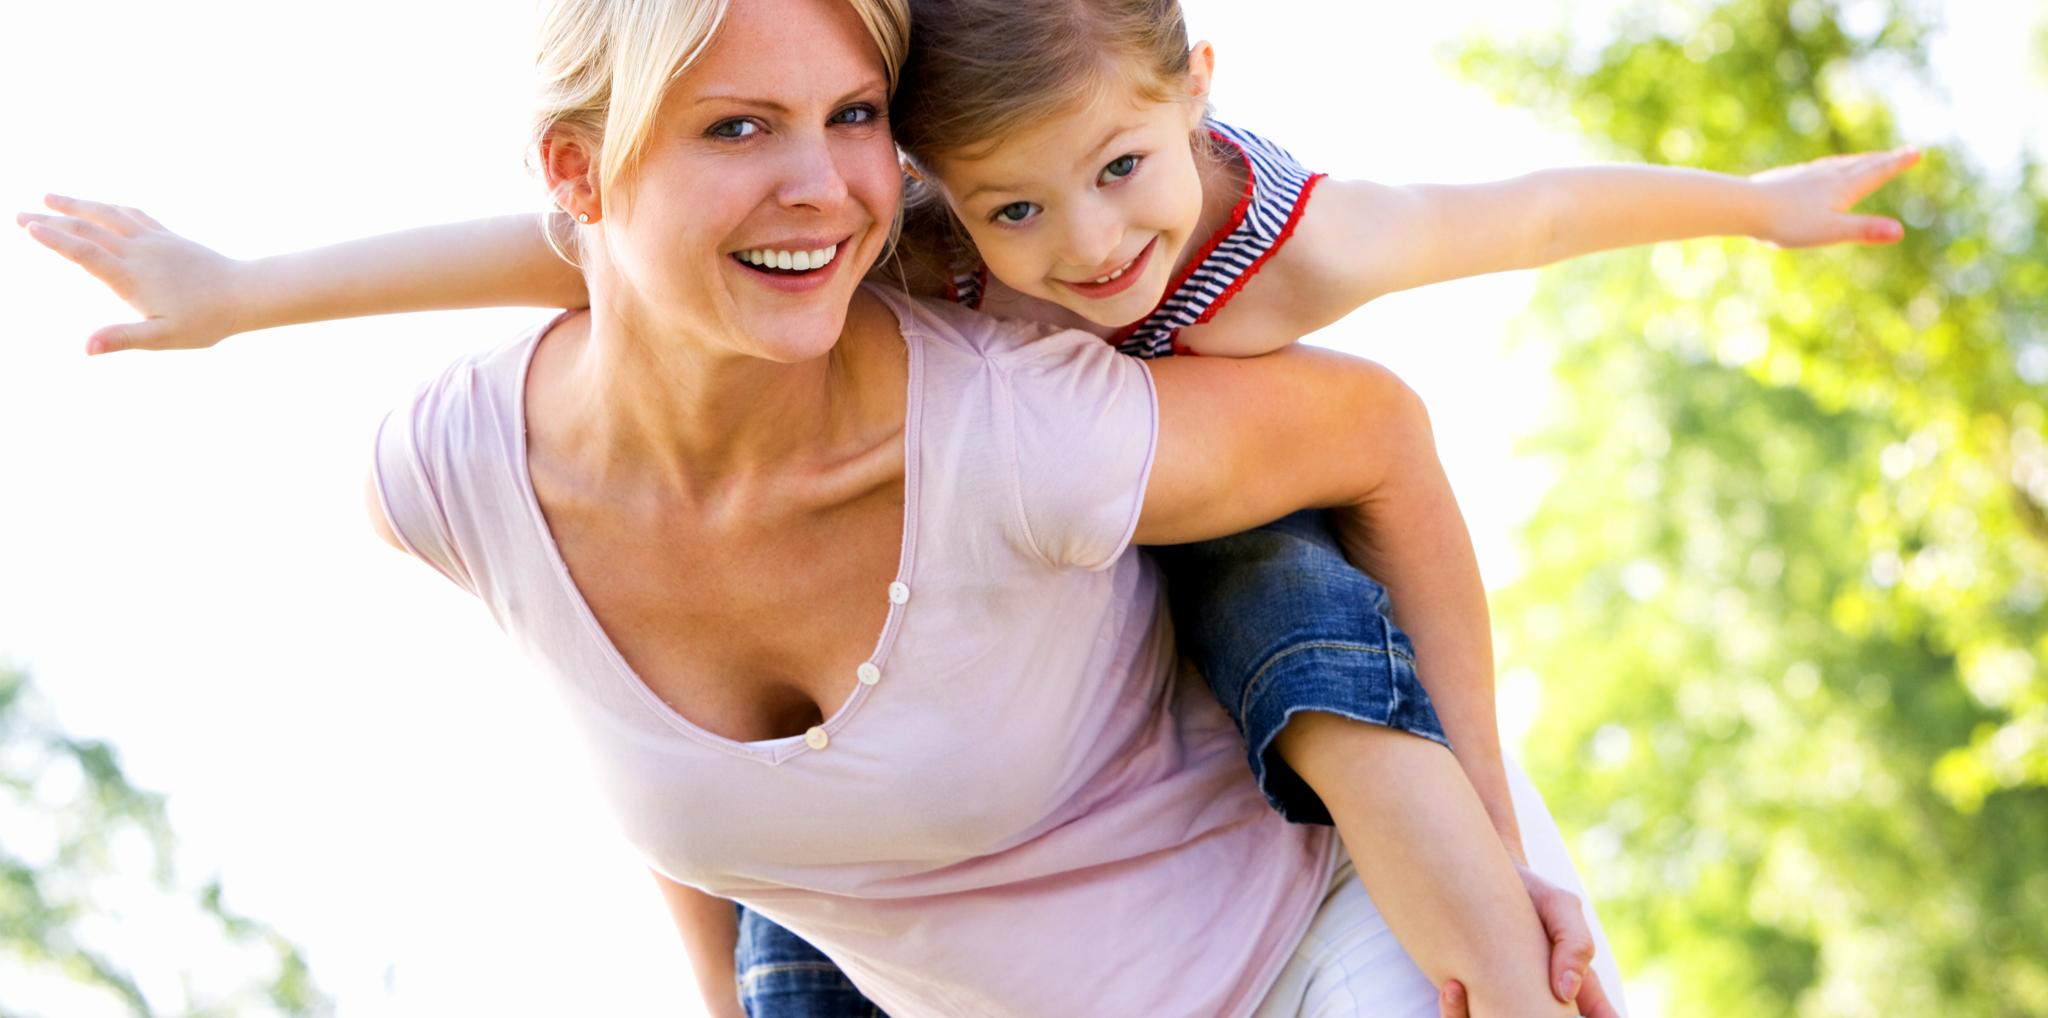 Better-Child-Behavior-A-Healthy-Structure.jpg